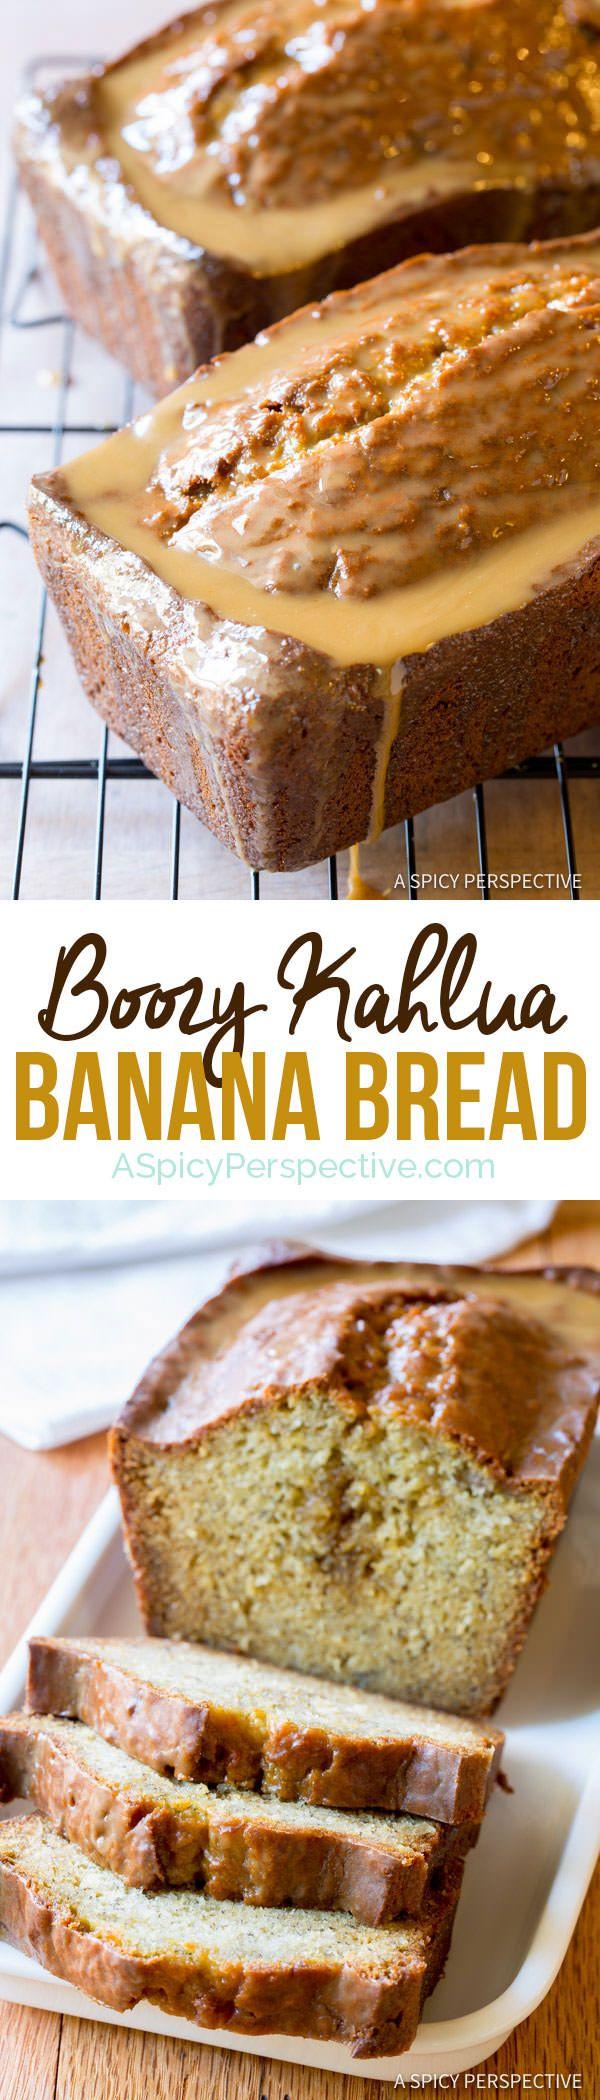 Dazzling Kahlua Banana Bread | ASpicyPerspective.com